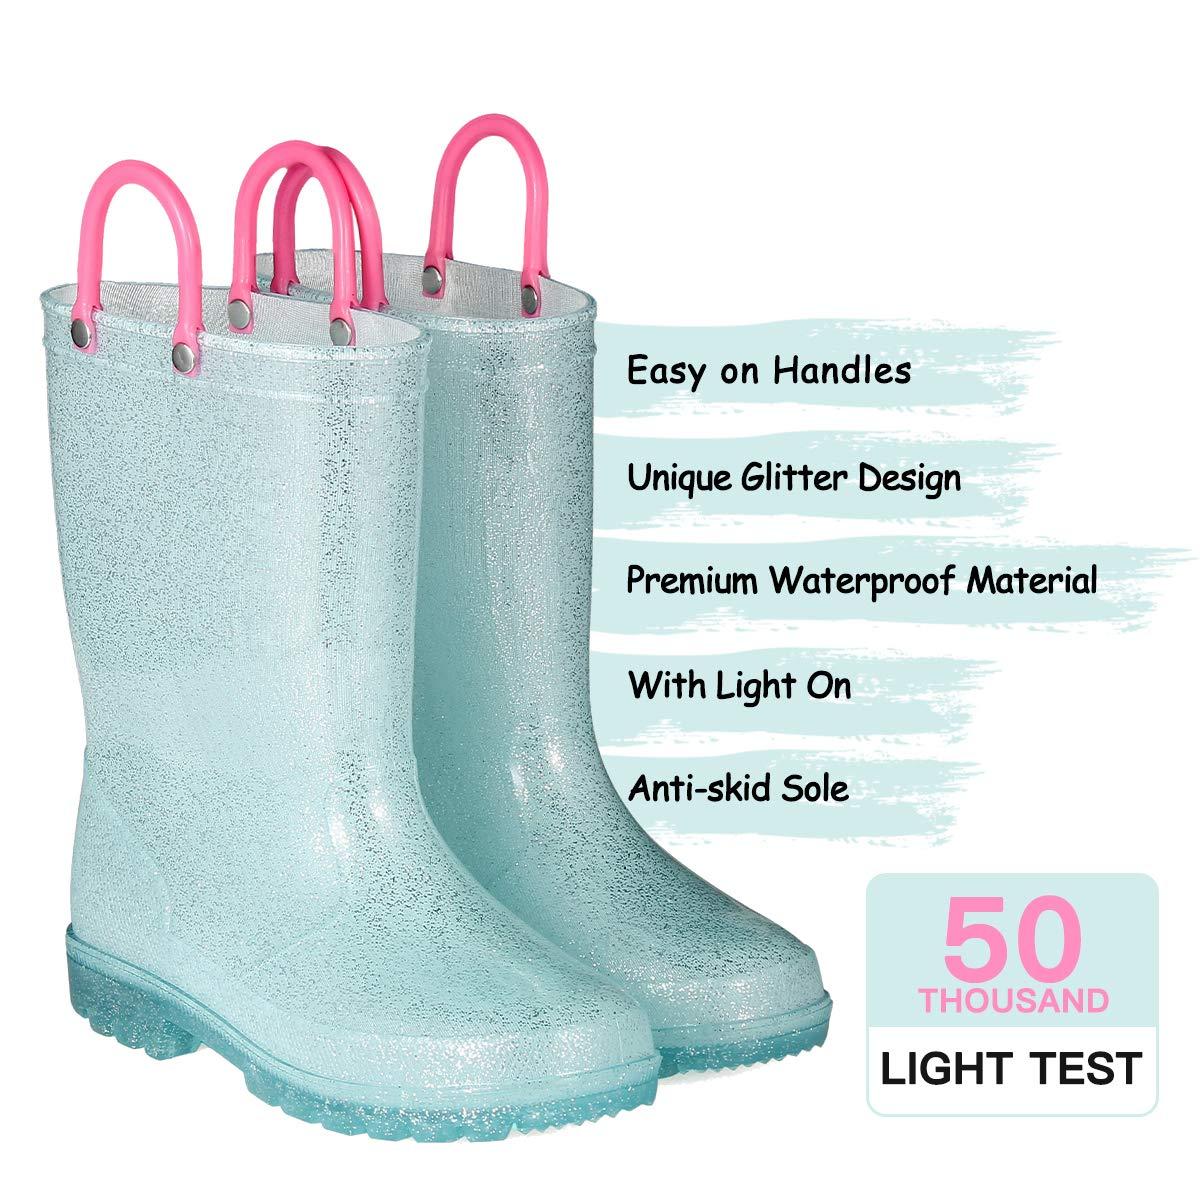 KomForme RPGL054-1M K Light Up Kids Rain Boots Glitter Girl Boots Blue by KomForme (Image #3)